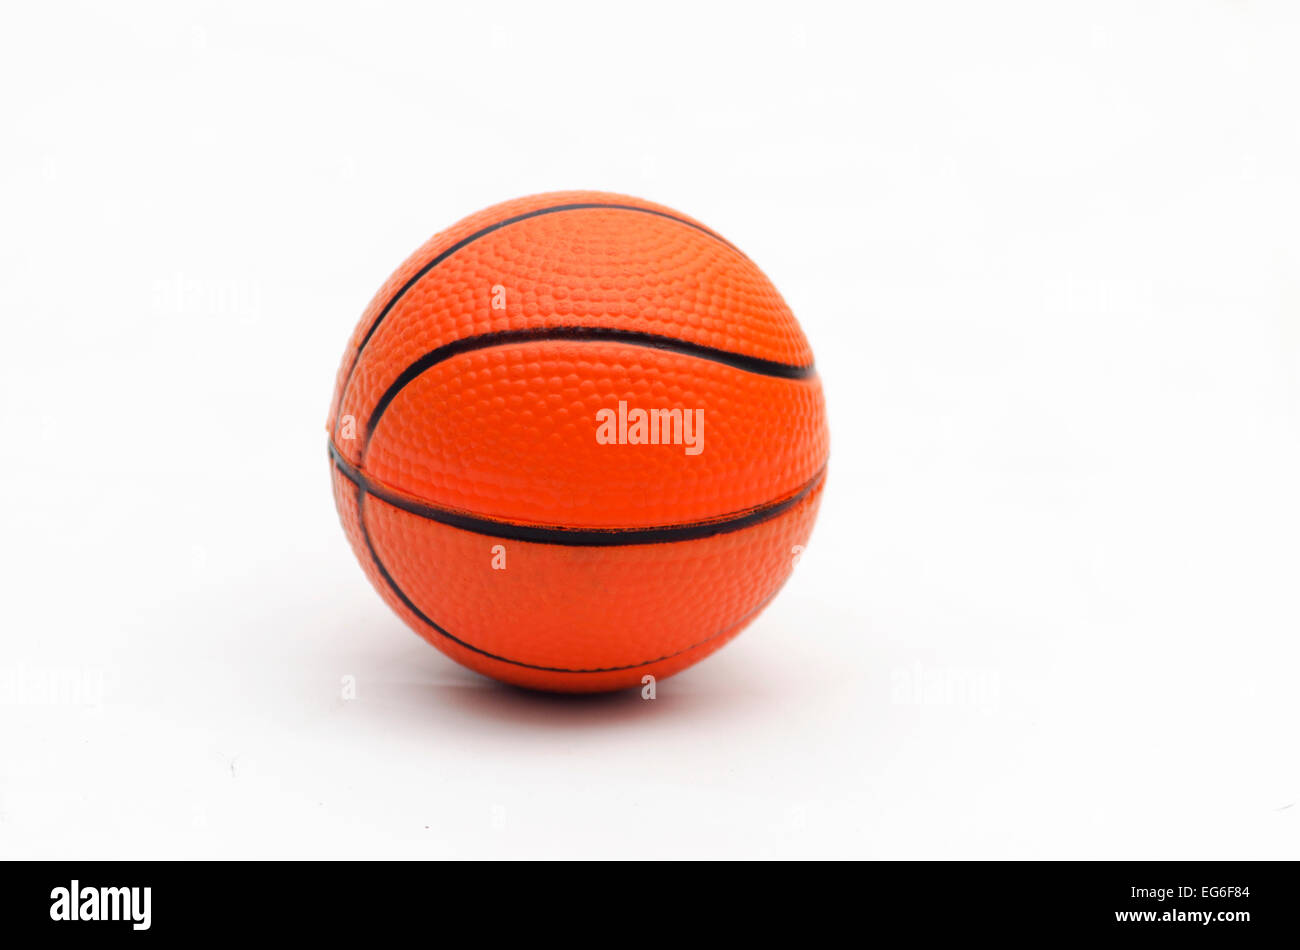 Orange basket su sfondo bianco Immagini Stock